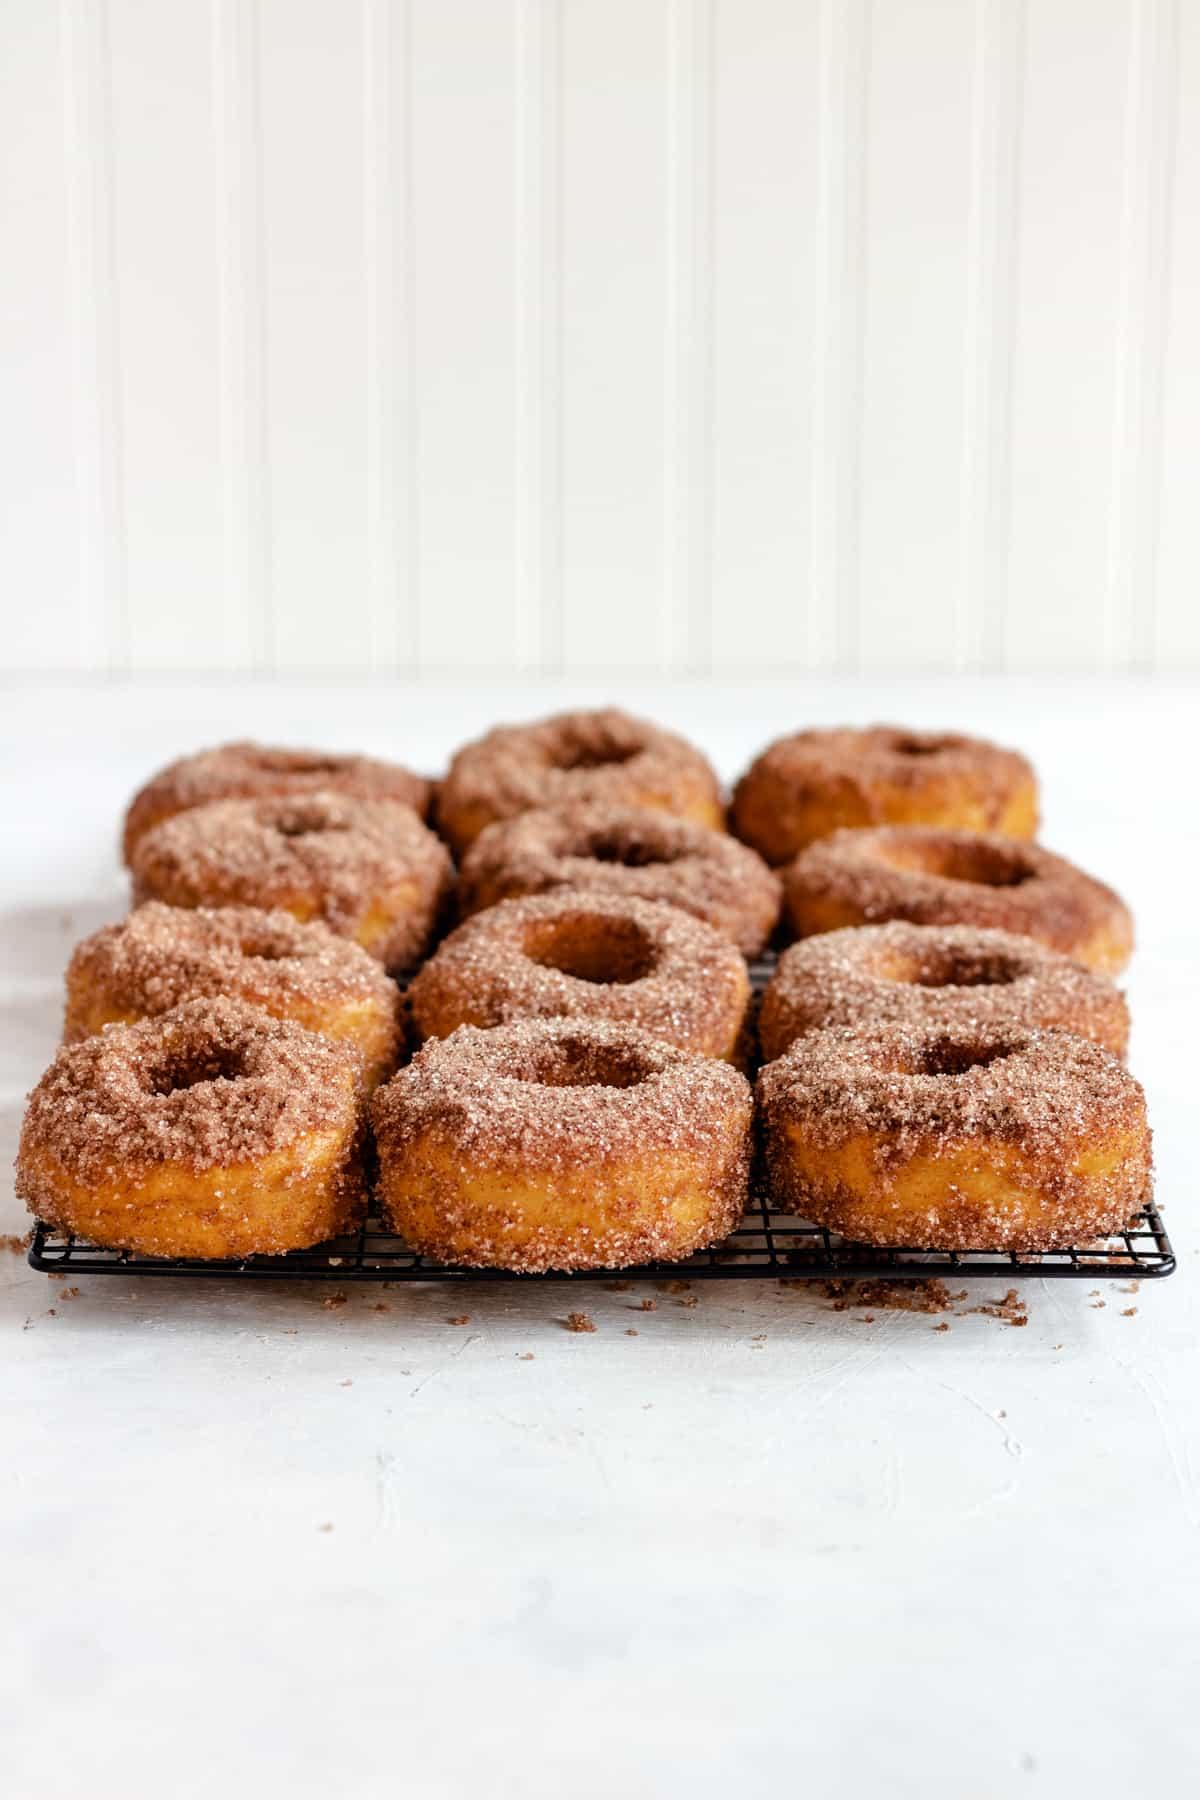 Baked Cinnamon Sugar Pumpkin Yeast Donuts